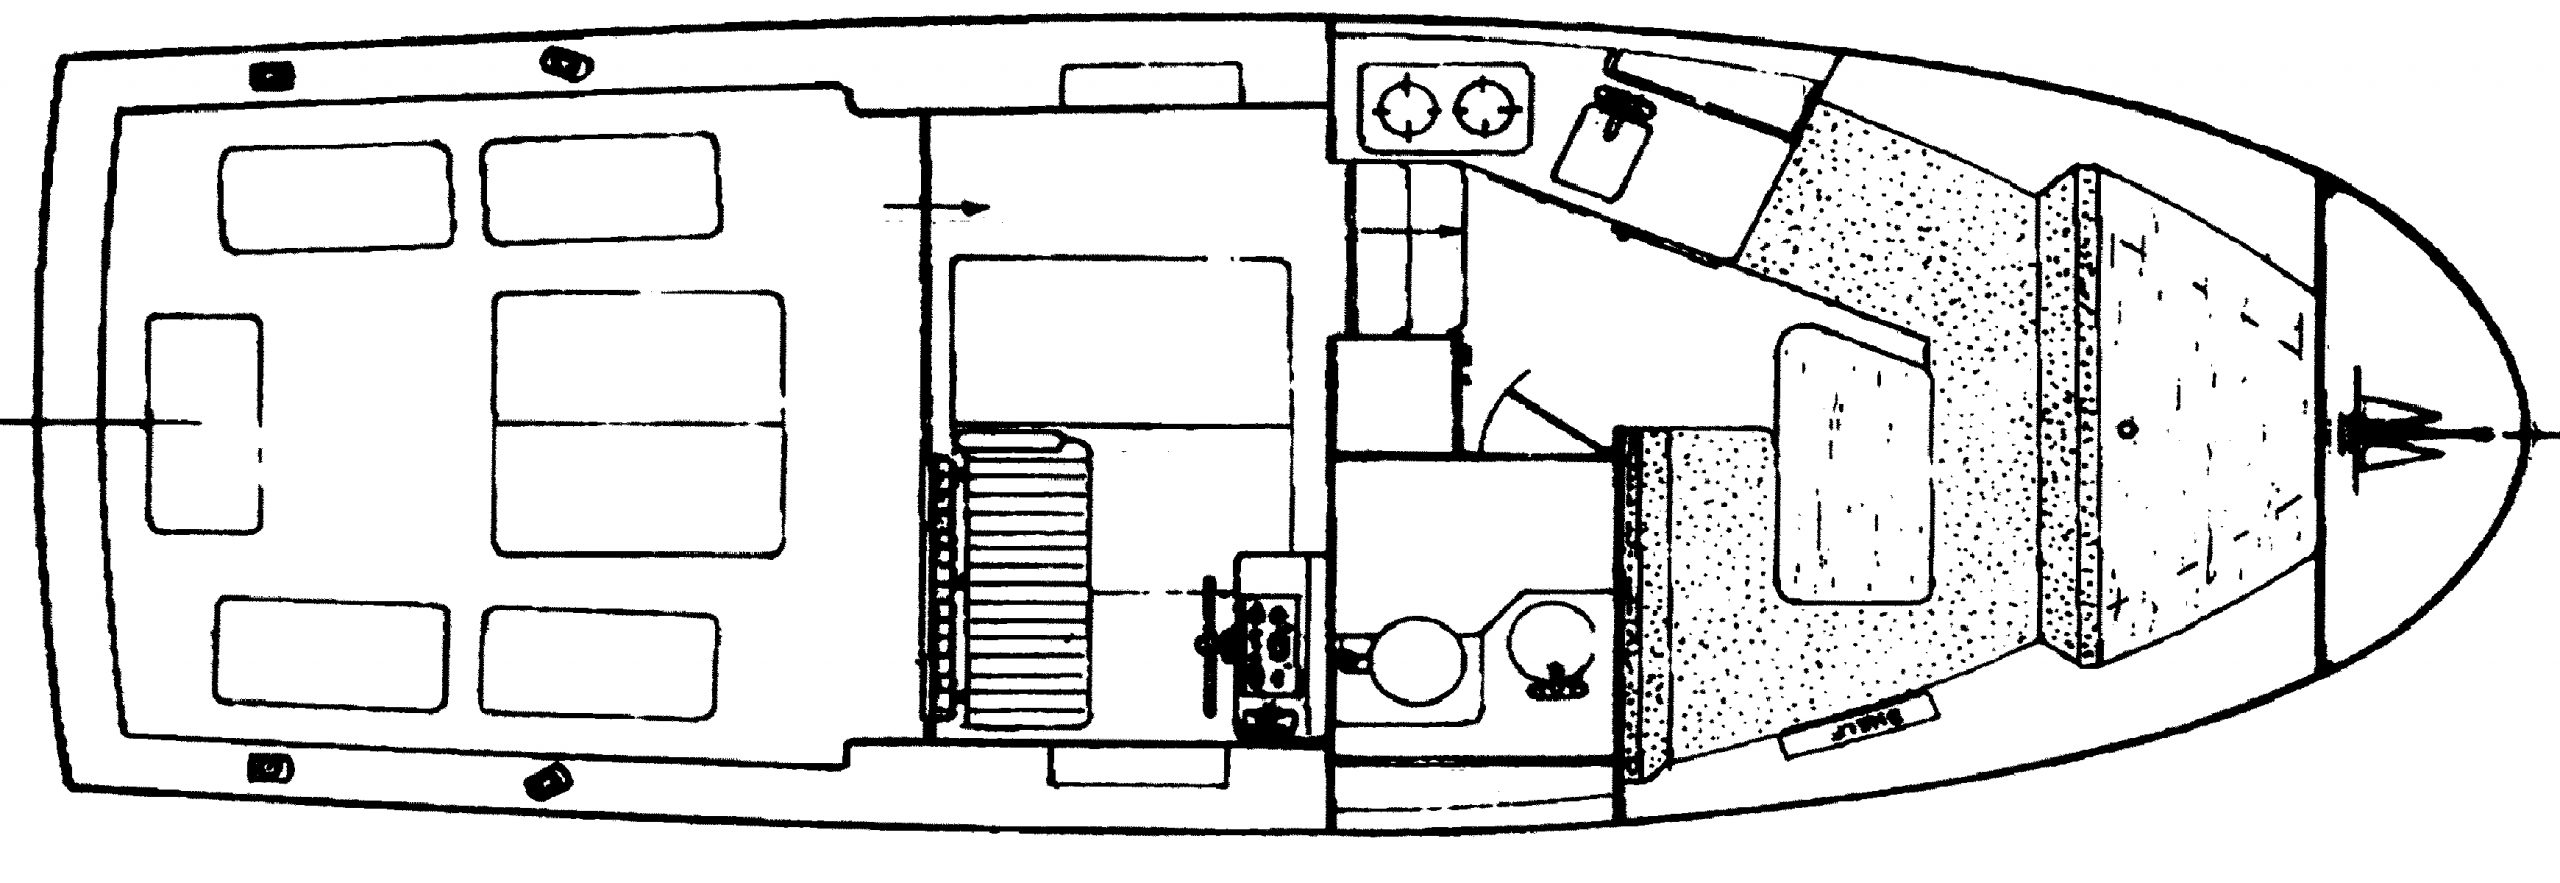 27 Sport Cruiser Floor Plan 1